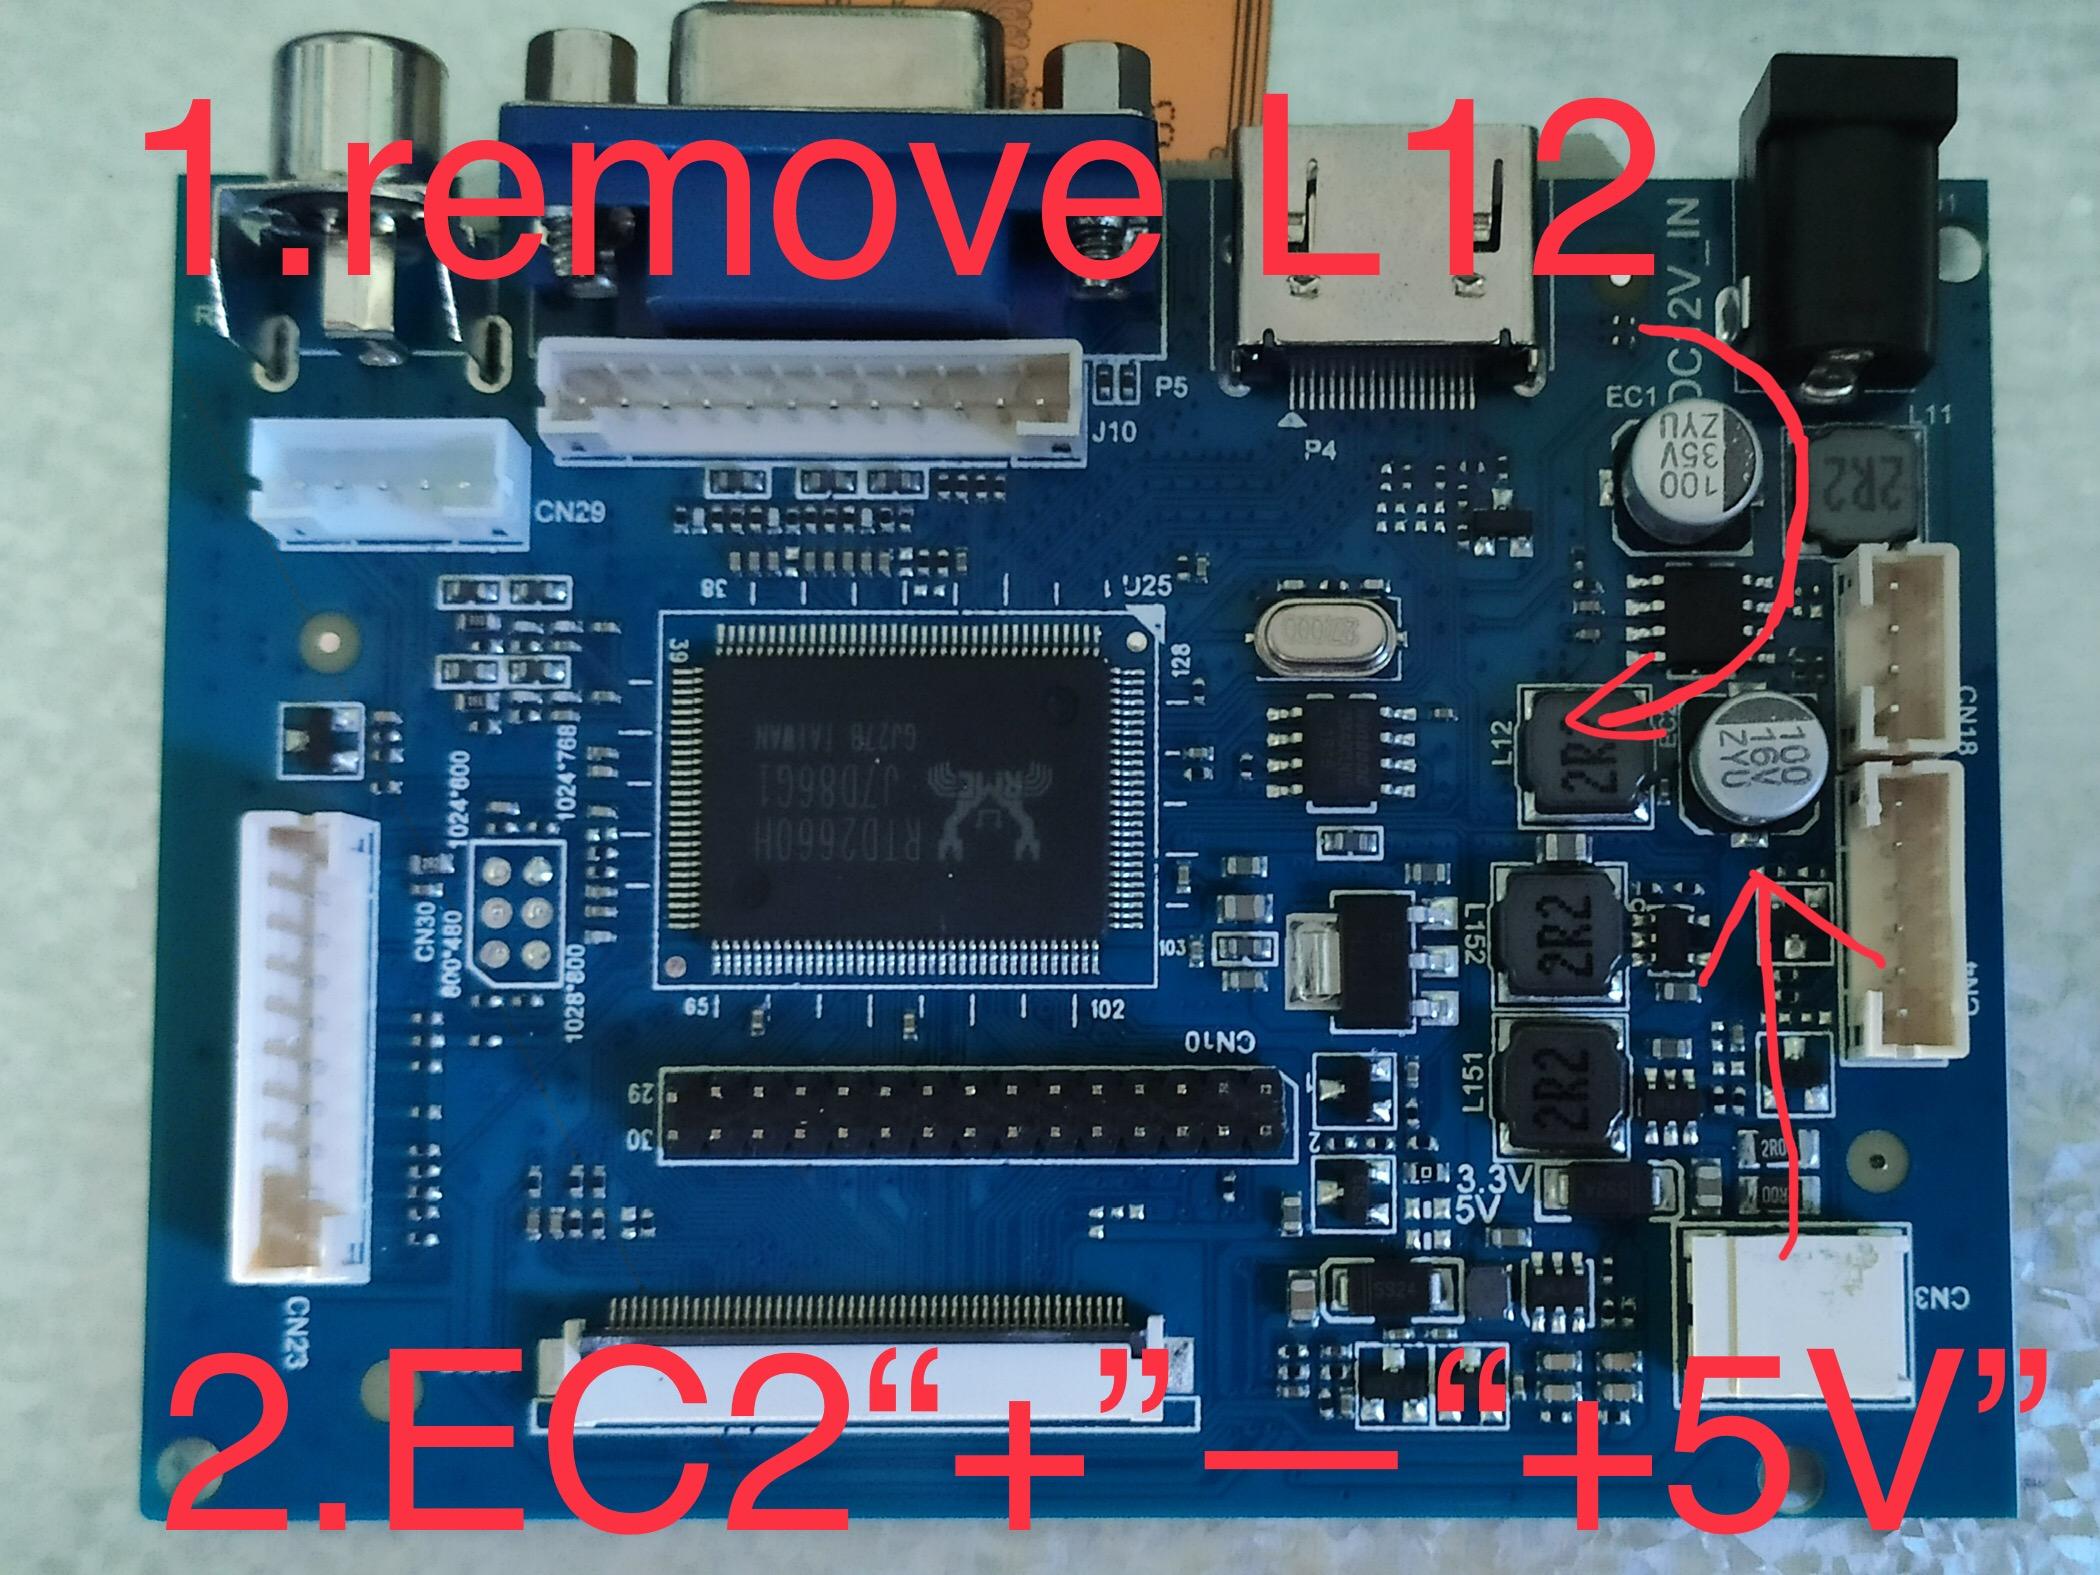 8252E51E-DAE2-4A2F-9408-F1C953D3BB77.jpeg